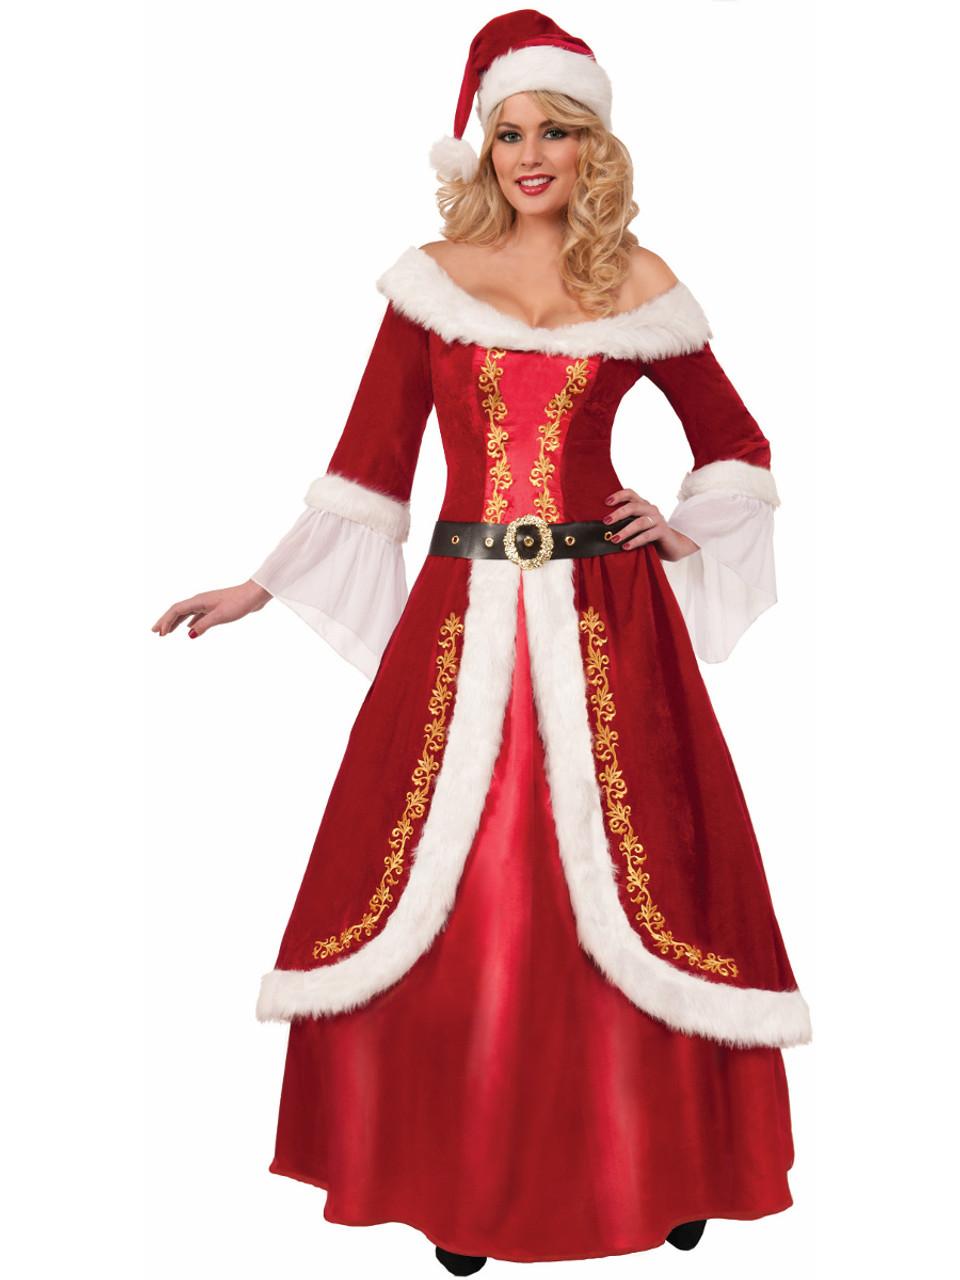 20b578c723d5 Womens Premium Mrs Santa Claus Red Dress Christmas Holiday Costume